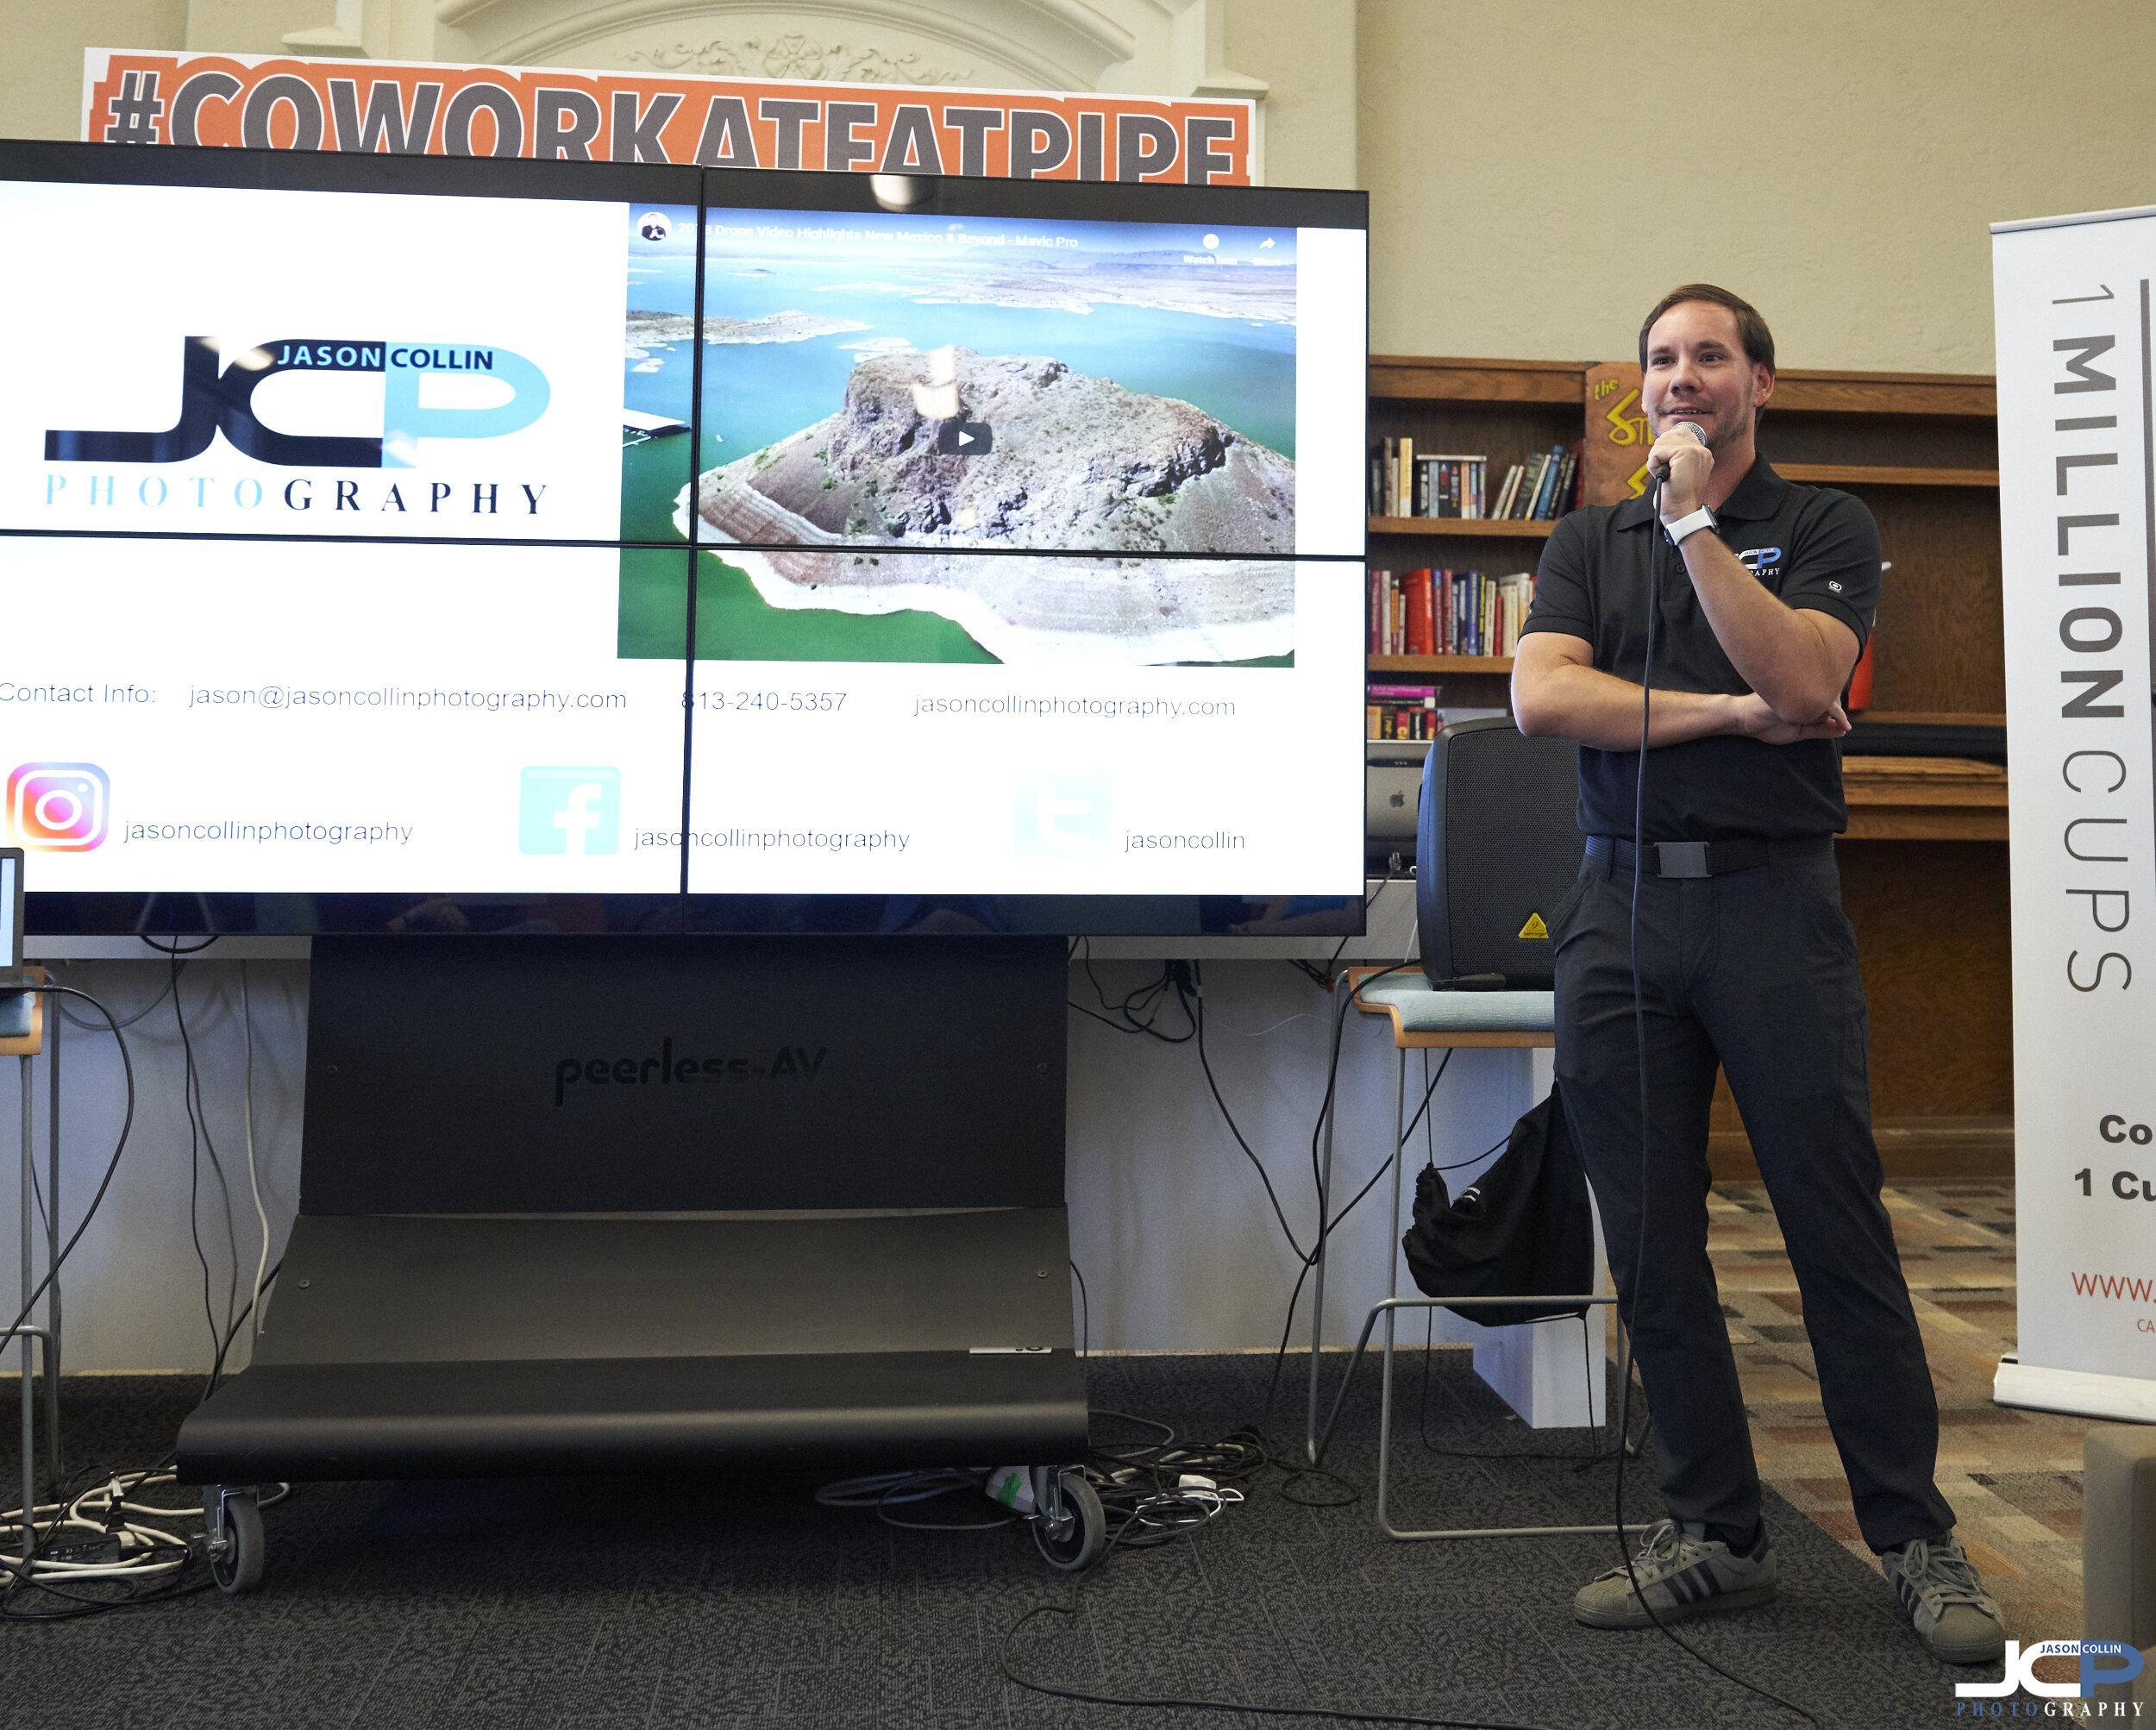 Jason Collin certified drone pilot in Albuquerque New Mexico